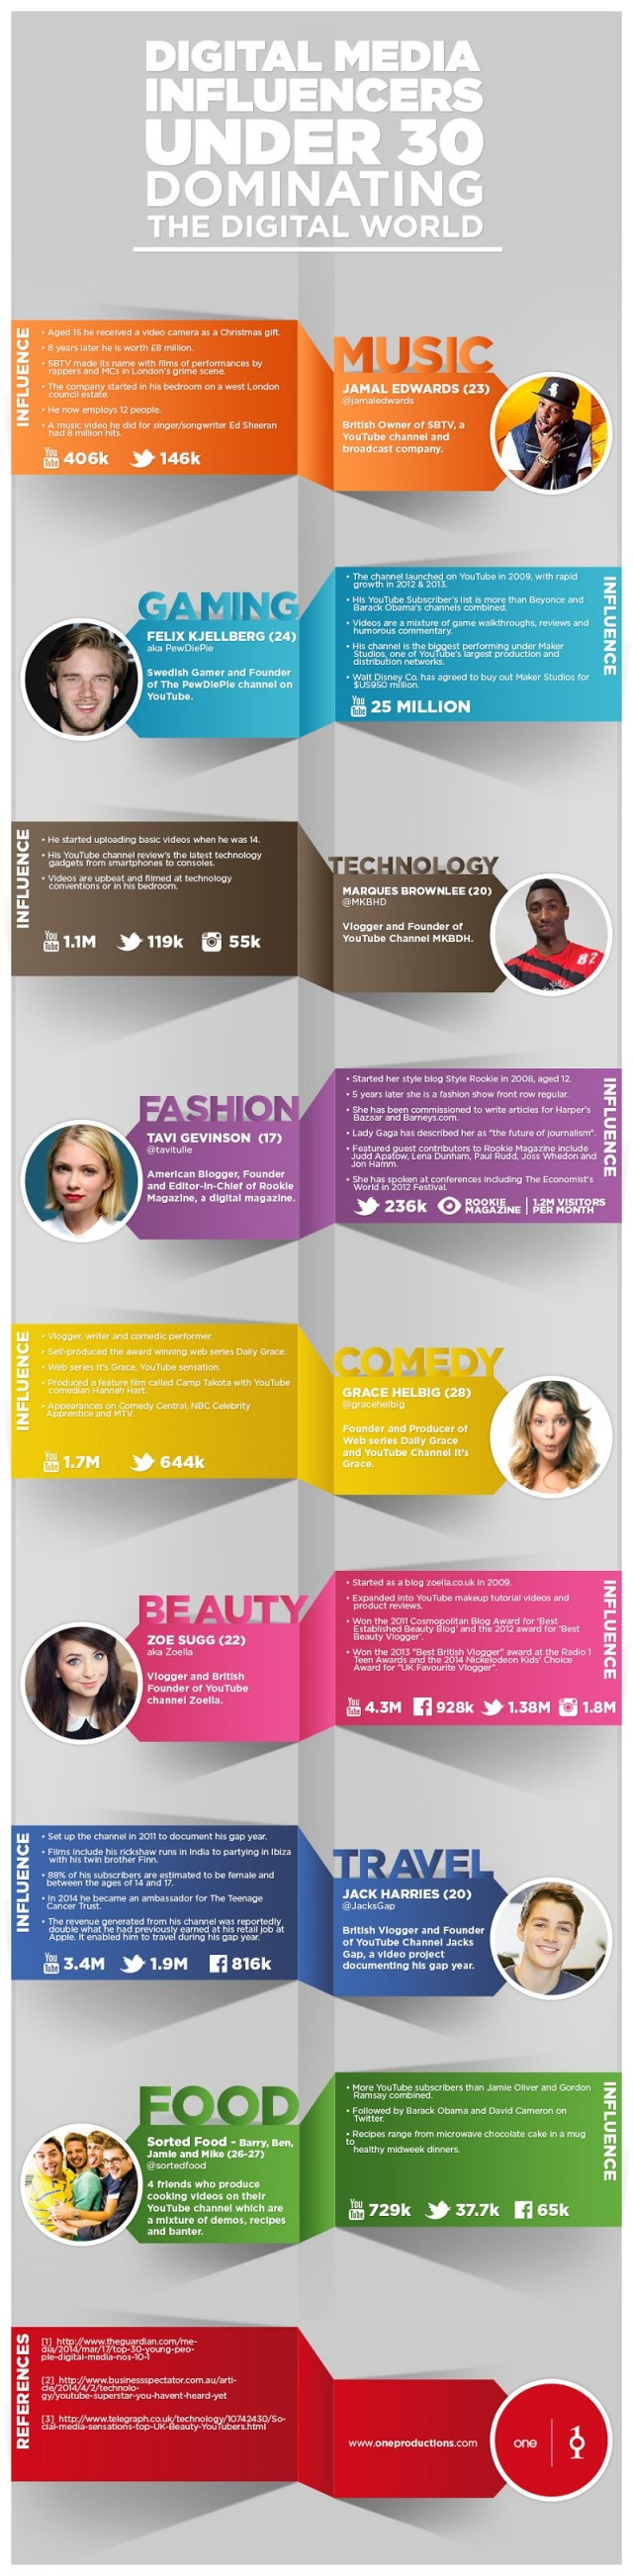 Digital Media Influencers Under 30